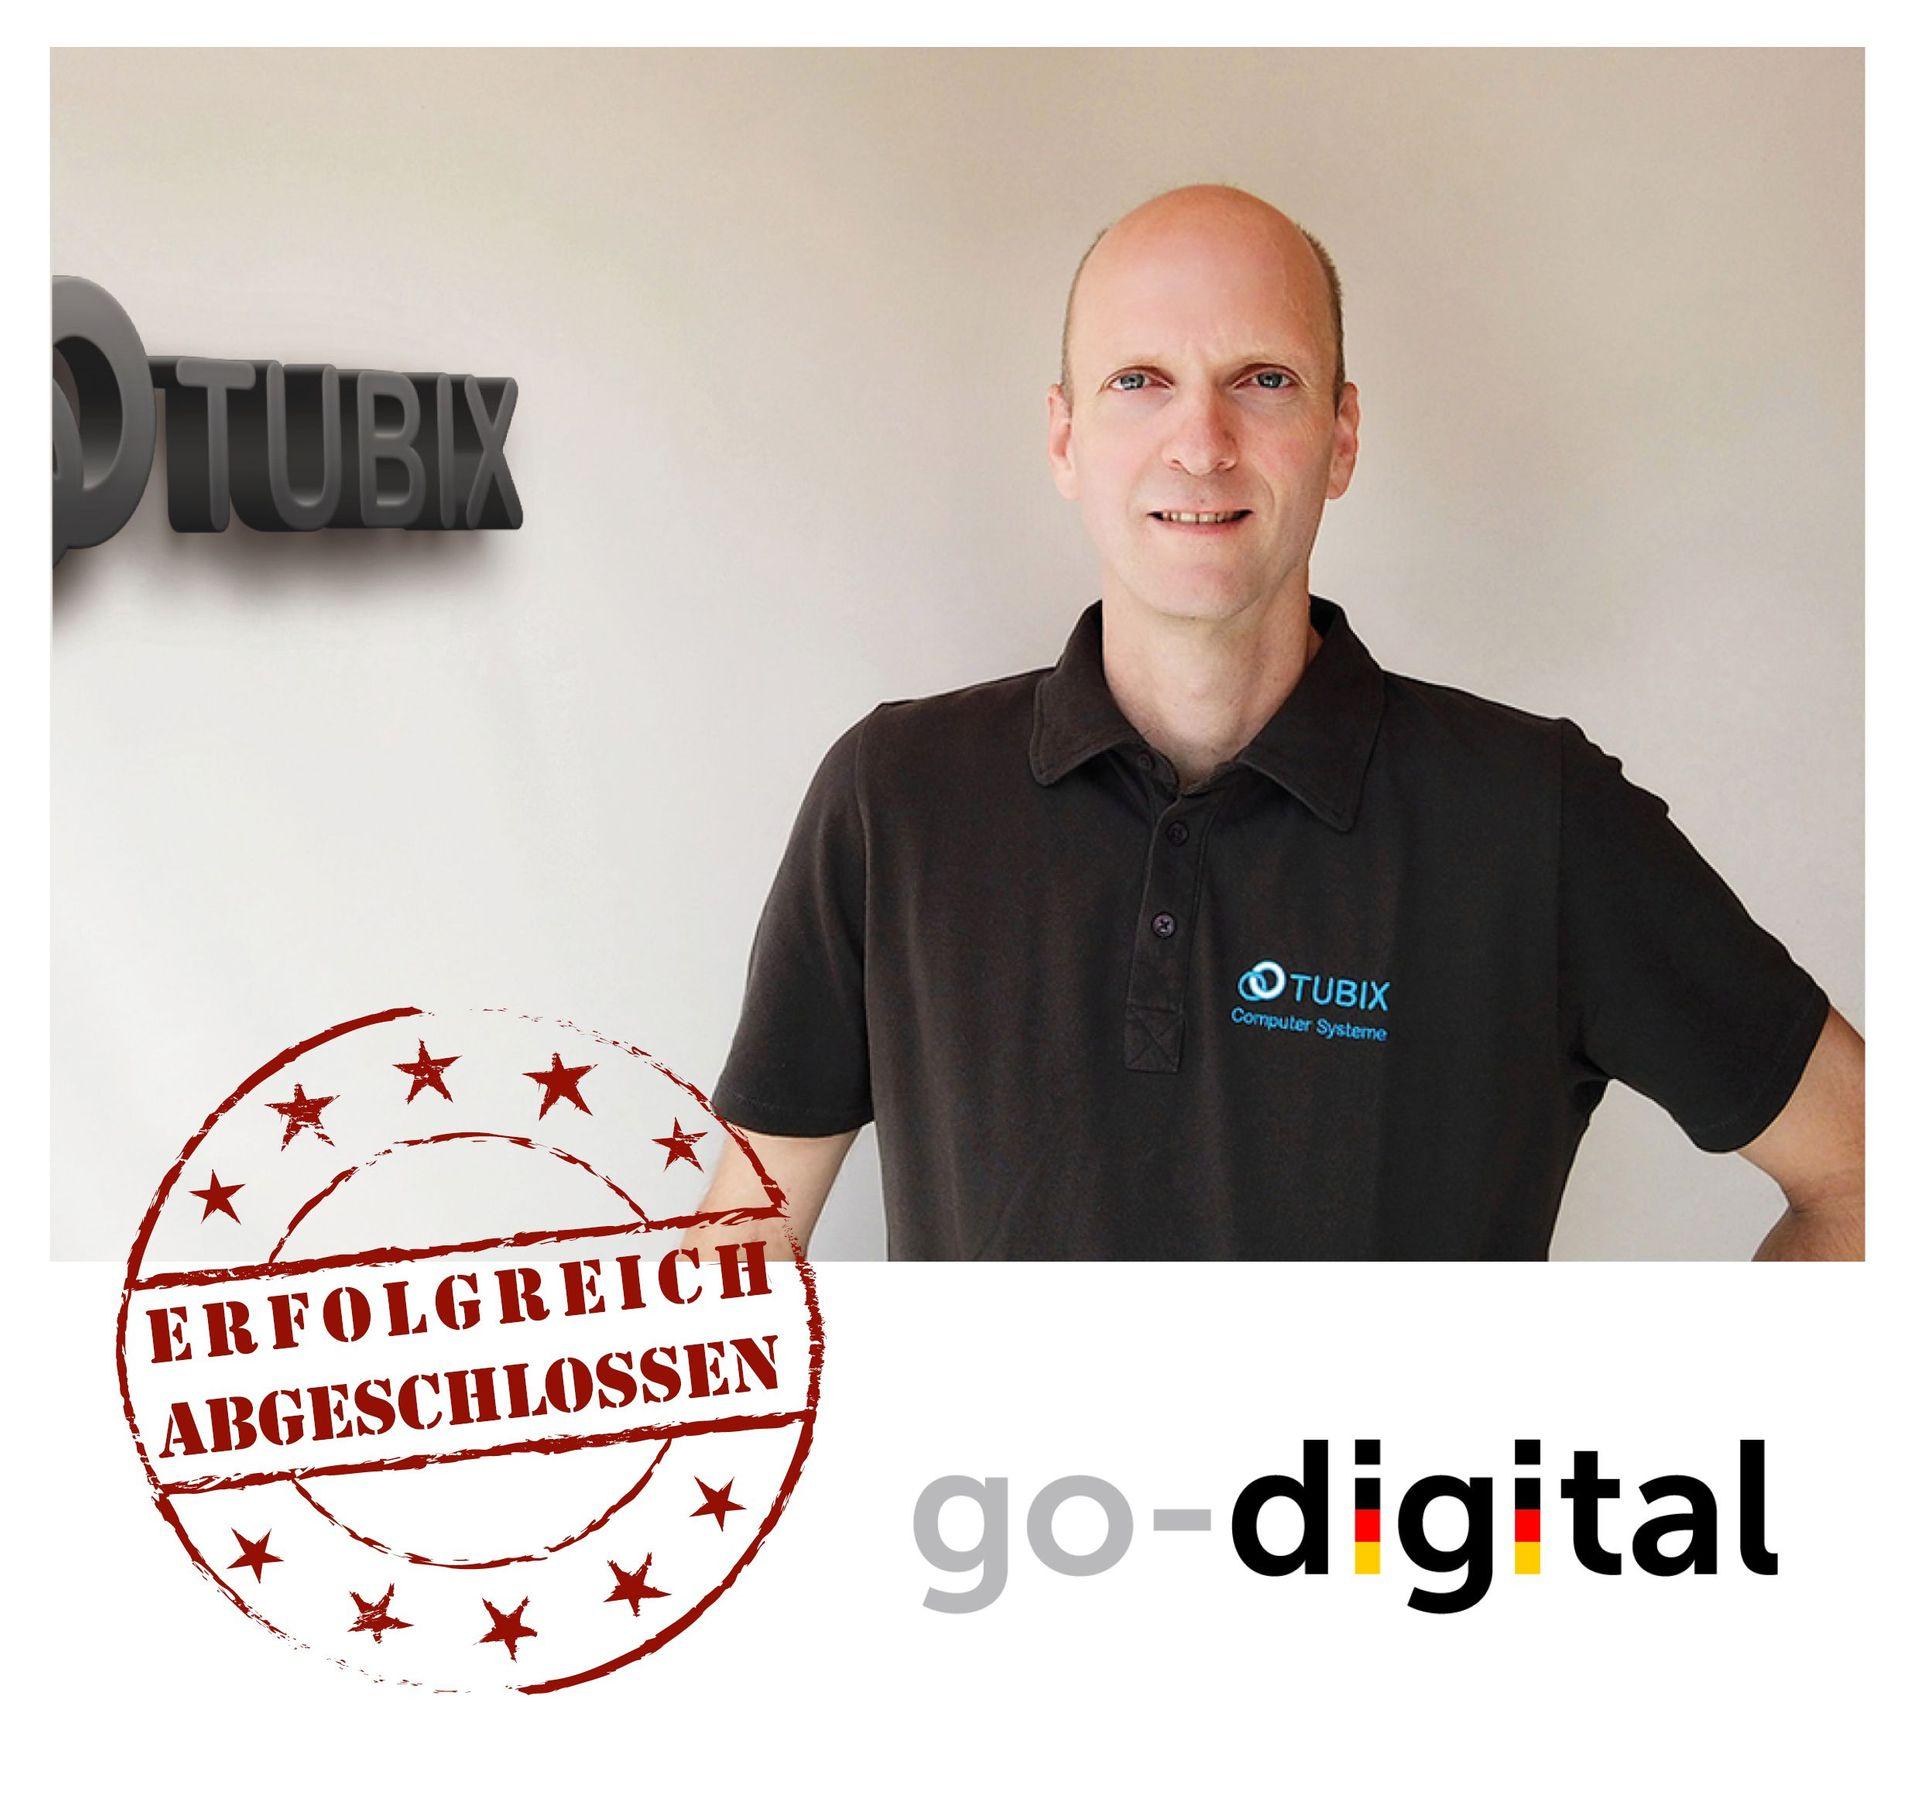 TUBIX ist autorisiertes Beratungsunternehmen im